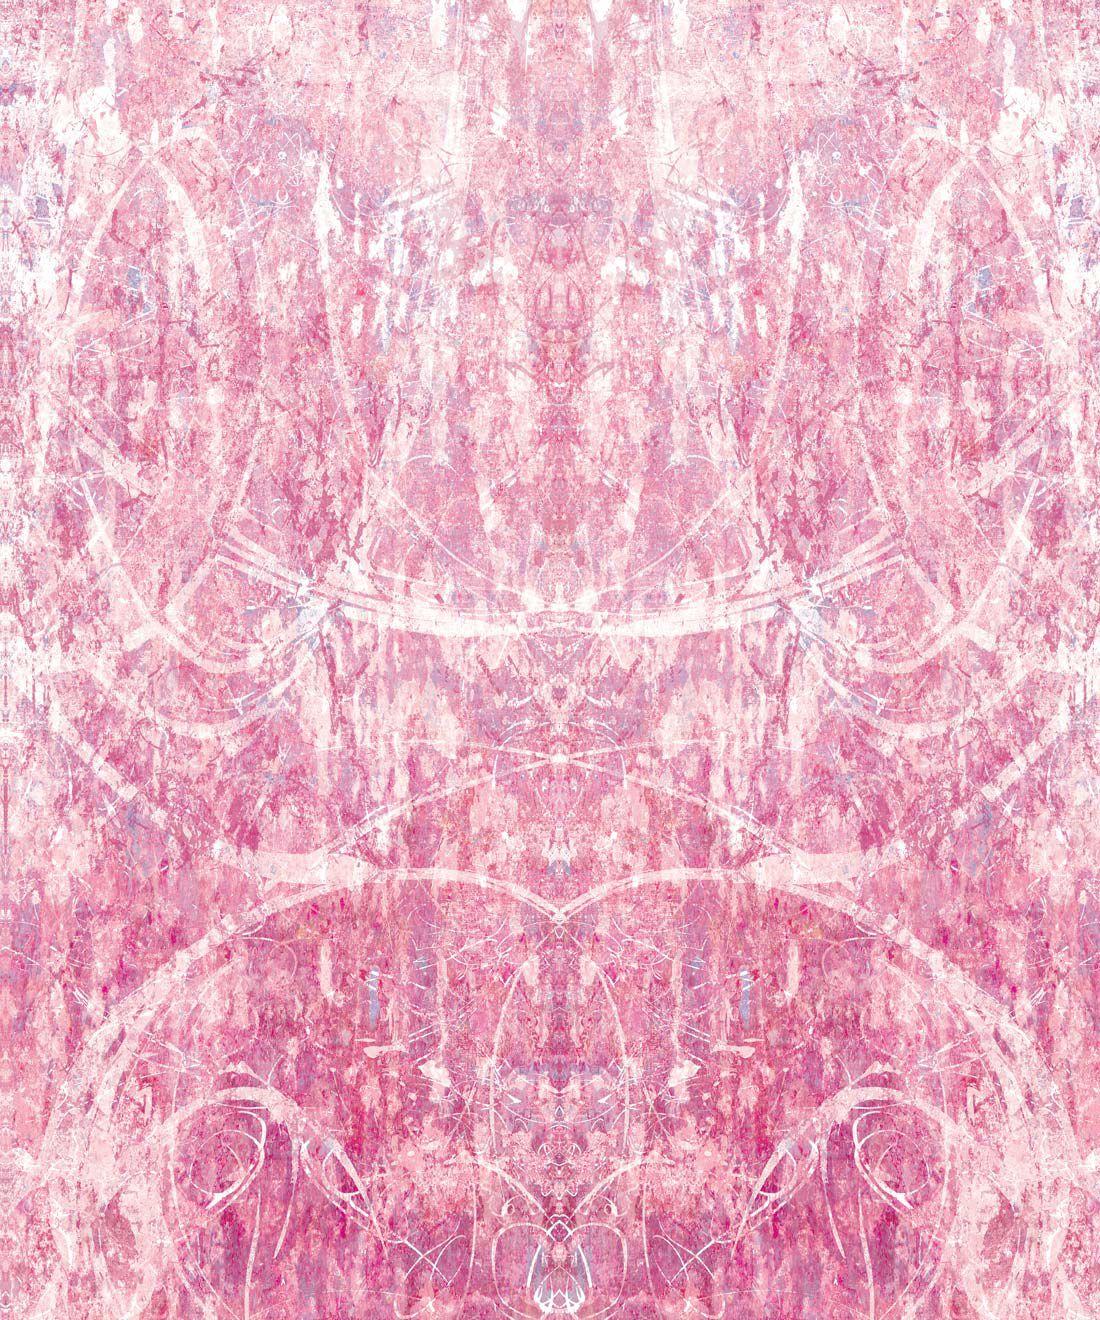 Hori Wallpaper